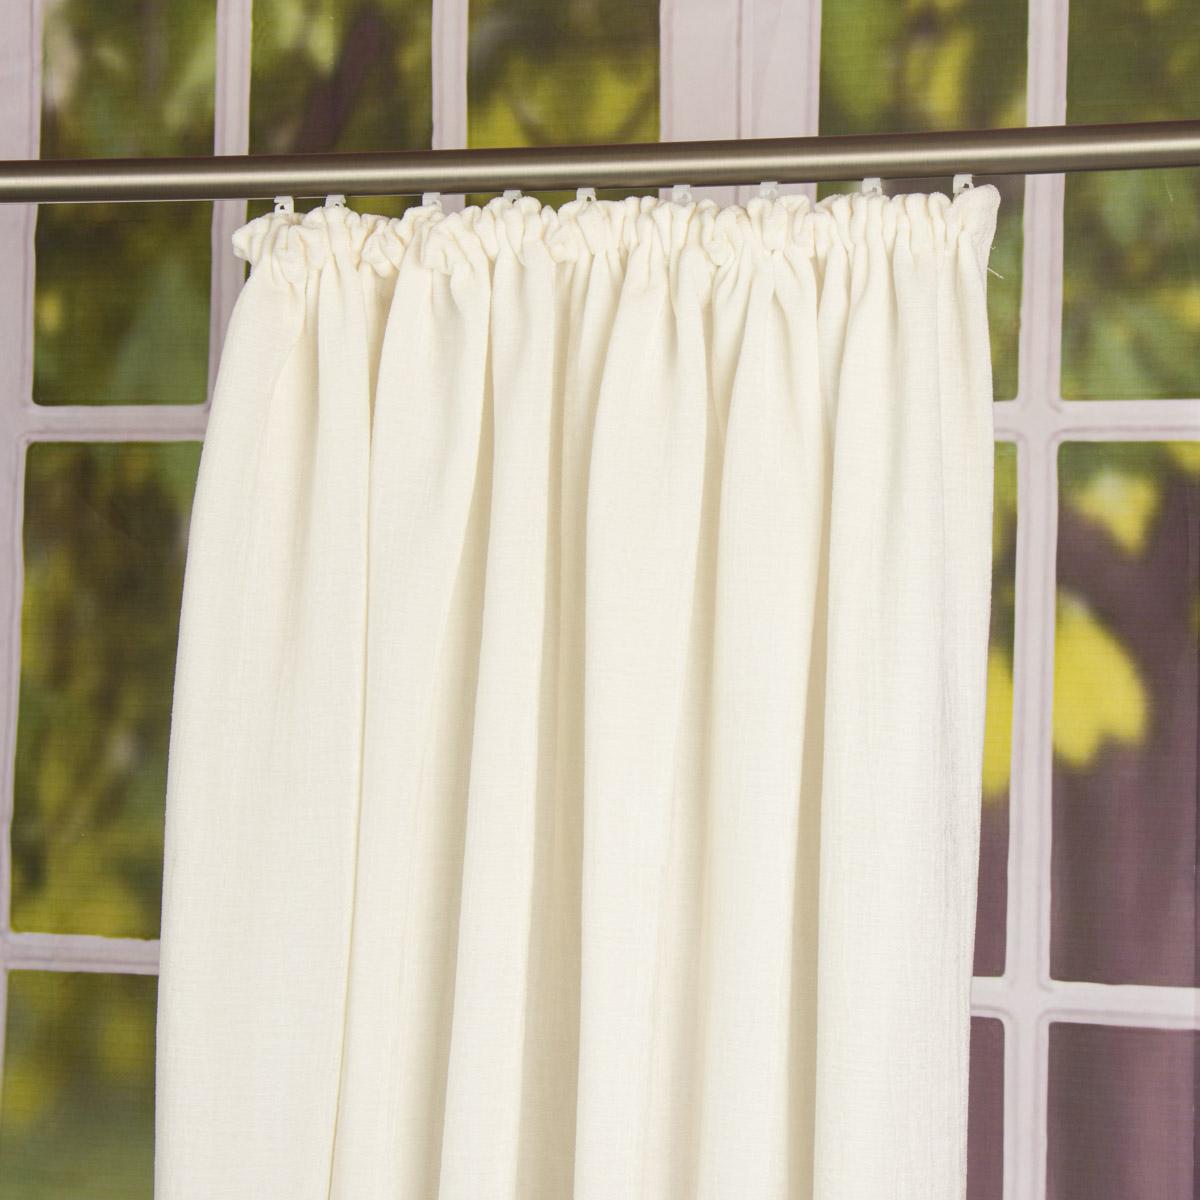 thermo chenille vorhang fertigvorhang k lteschutz schallschutz verdunkelung inuit beige. Black Bedroom Furniture Sets. Home Design Ideas